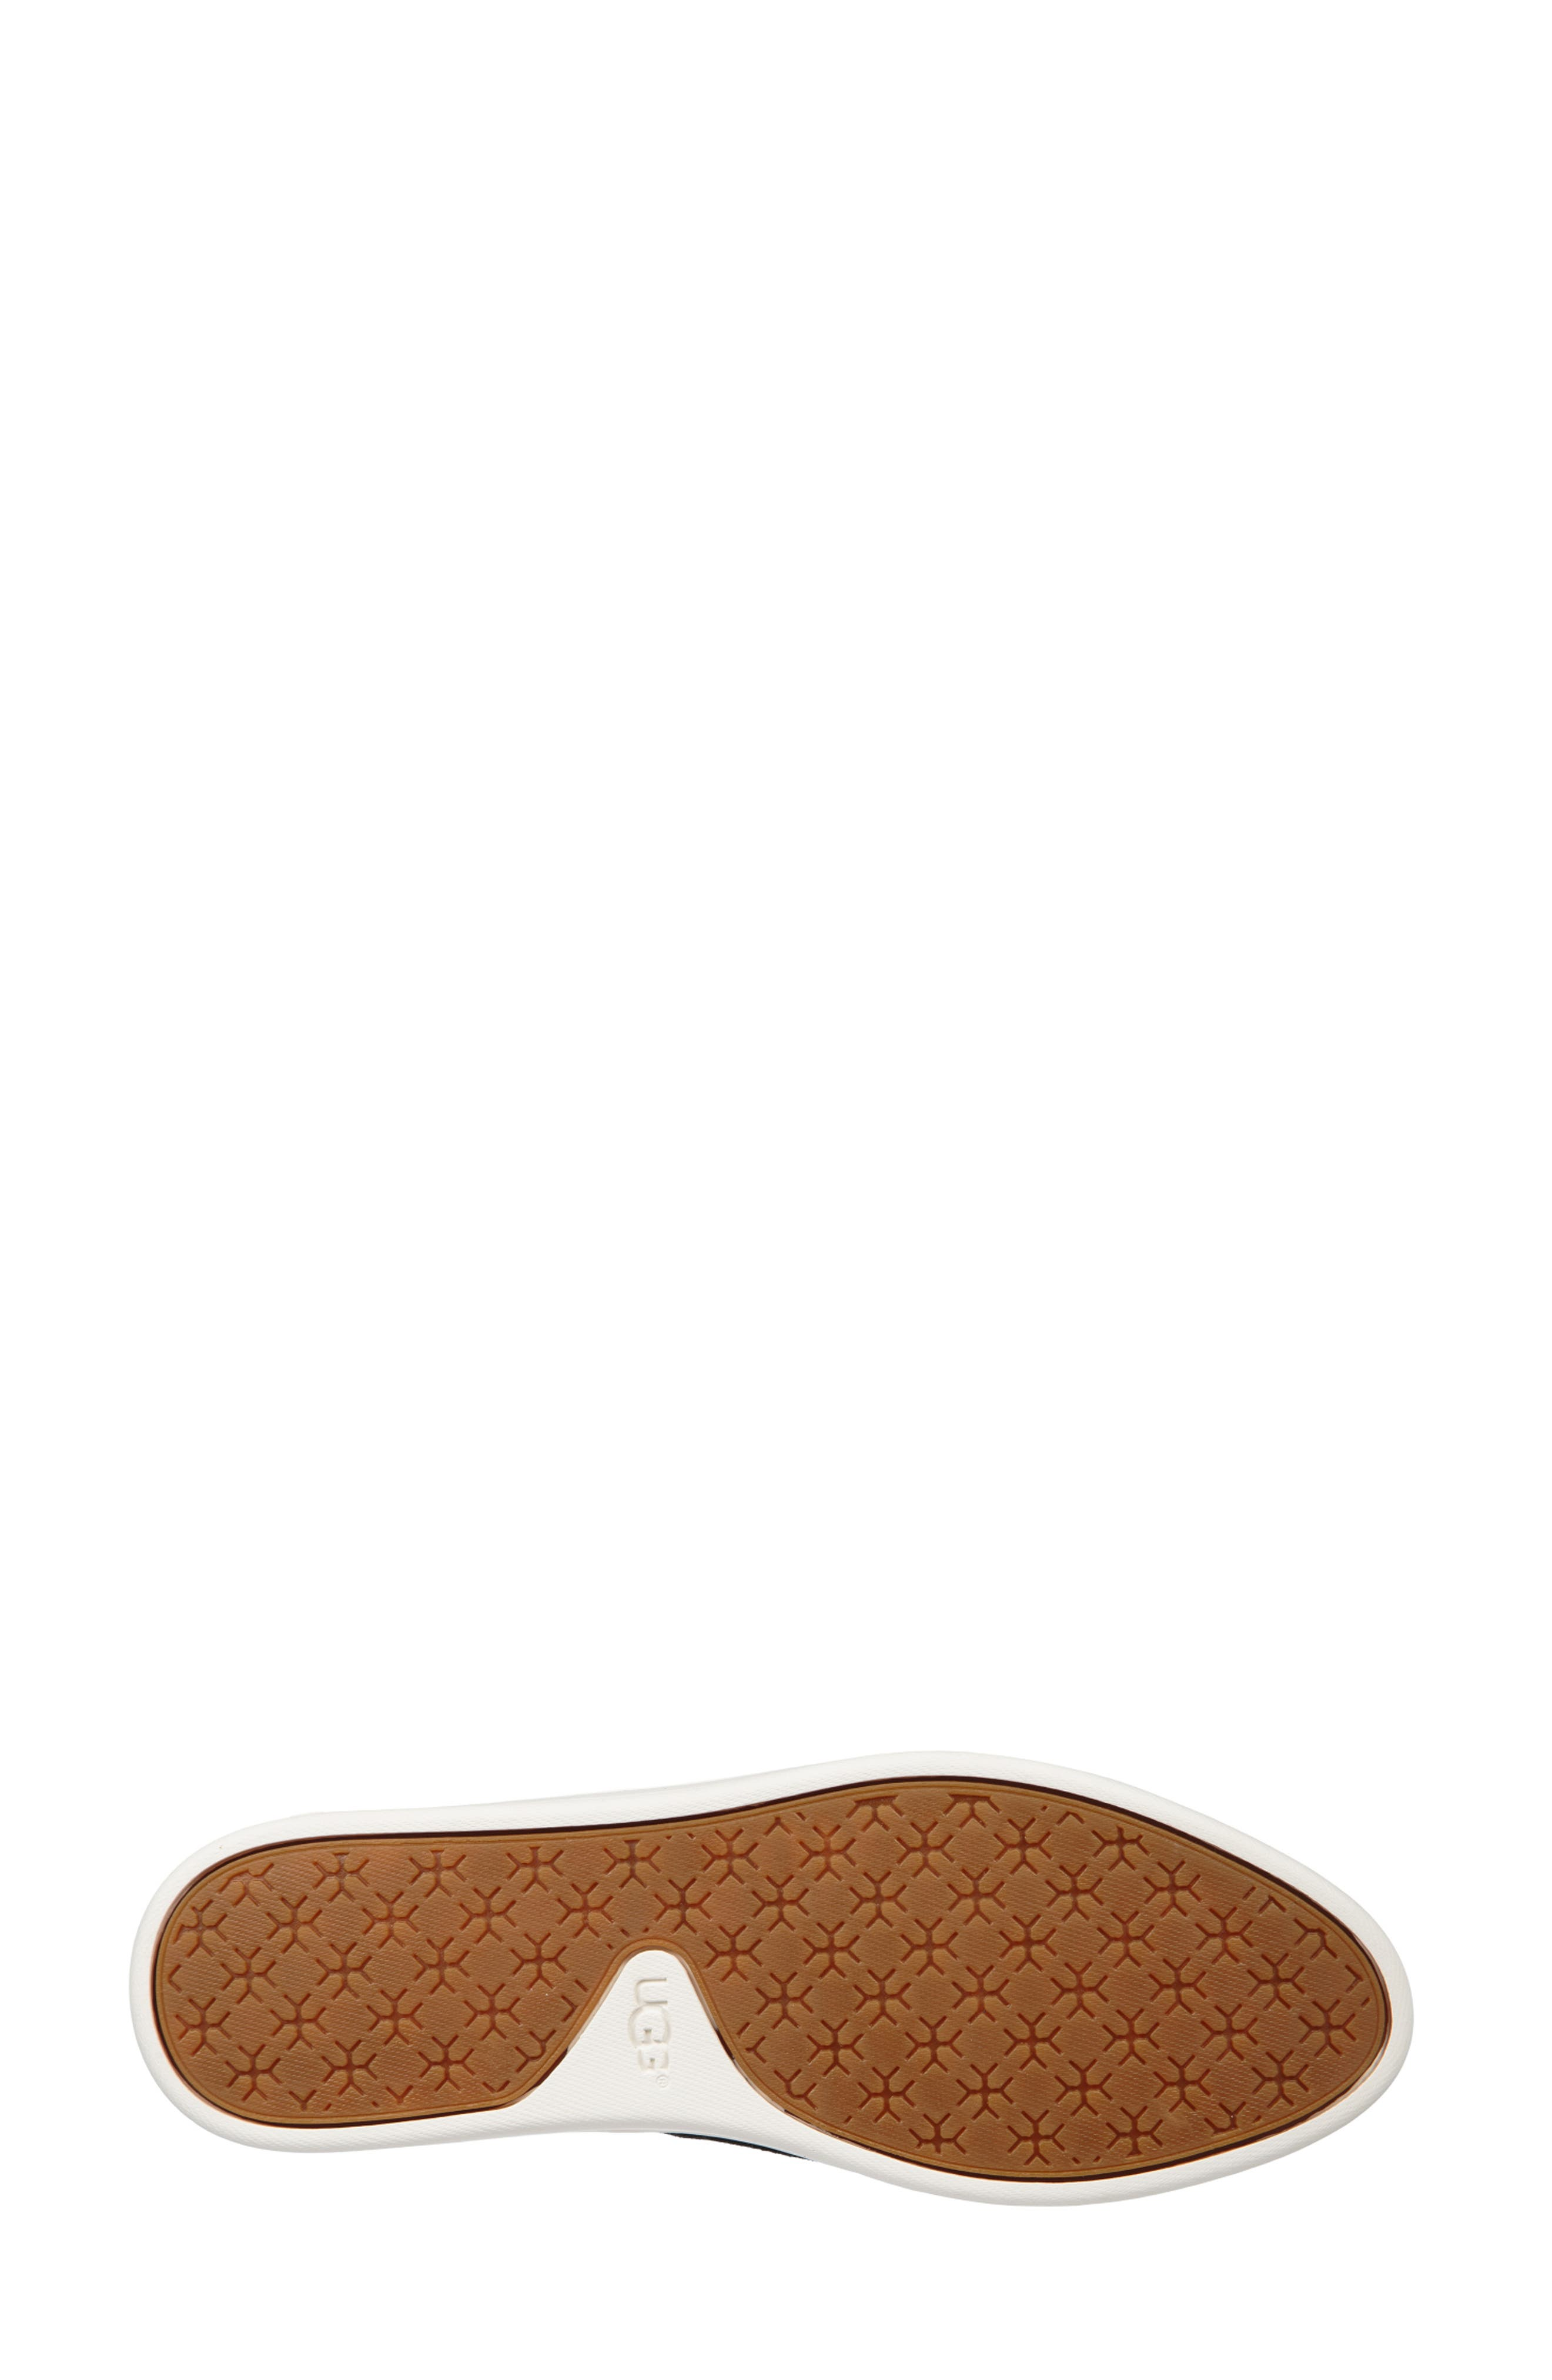 Soleda Genuine Calf Hair Slip-On Sneaker,                             Alternate thumbnail 5, color,                             BLACK